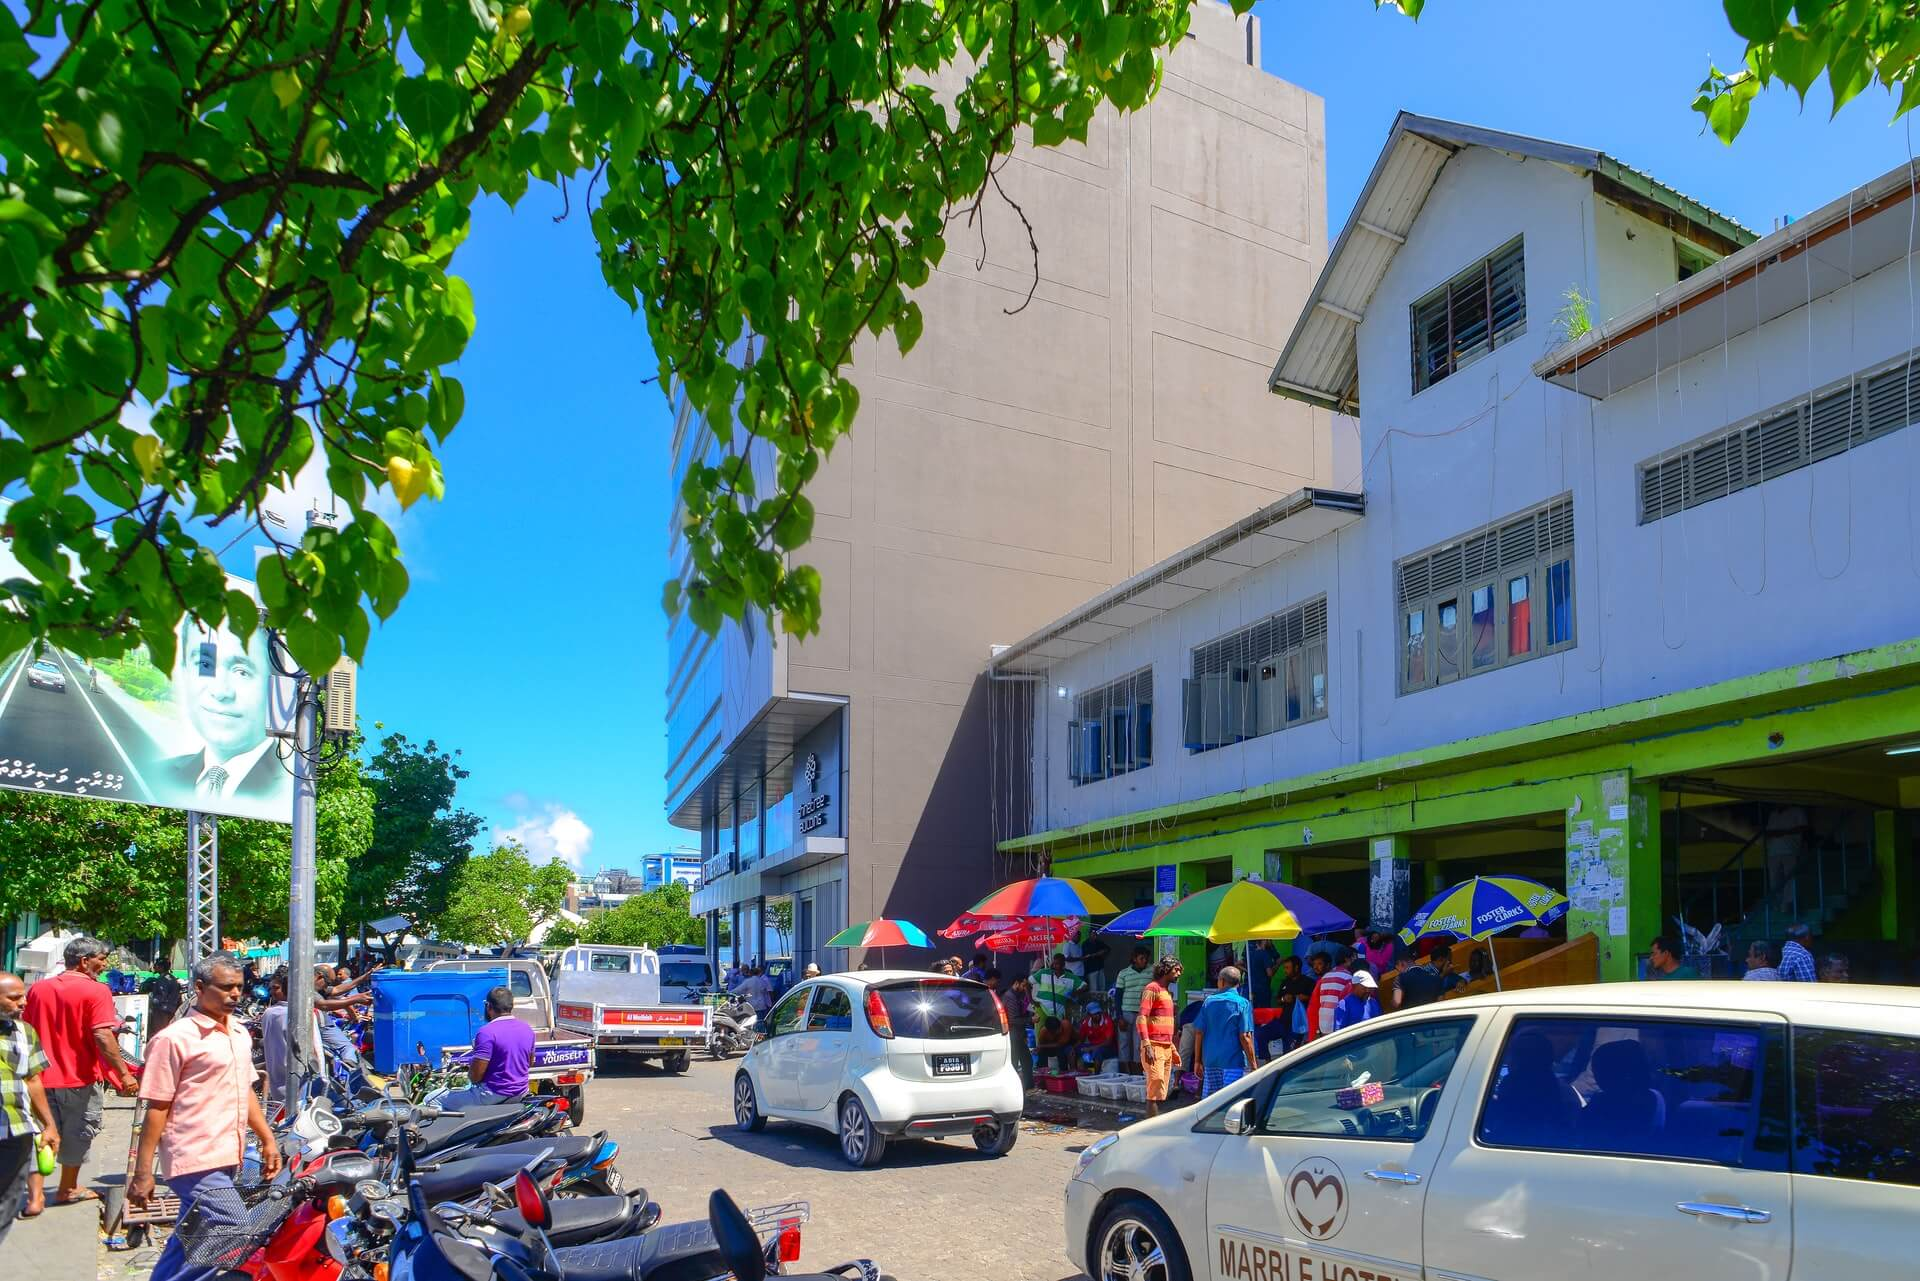 Dhivehi - Local Language of The Maldives